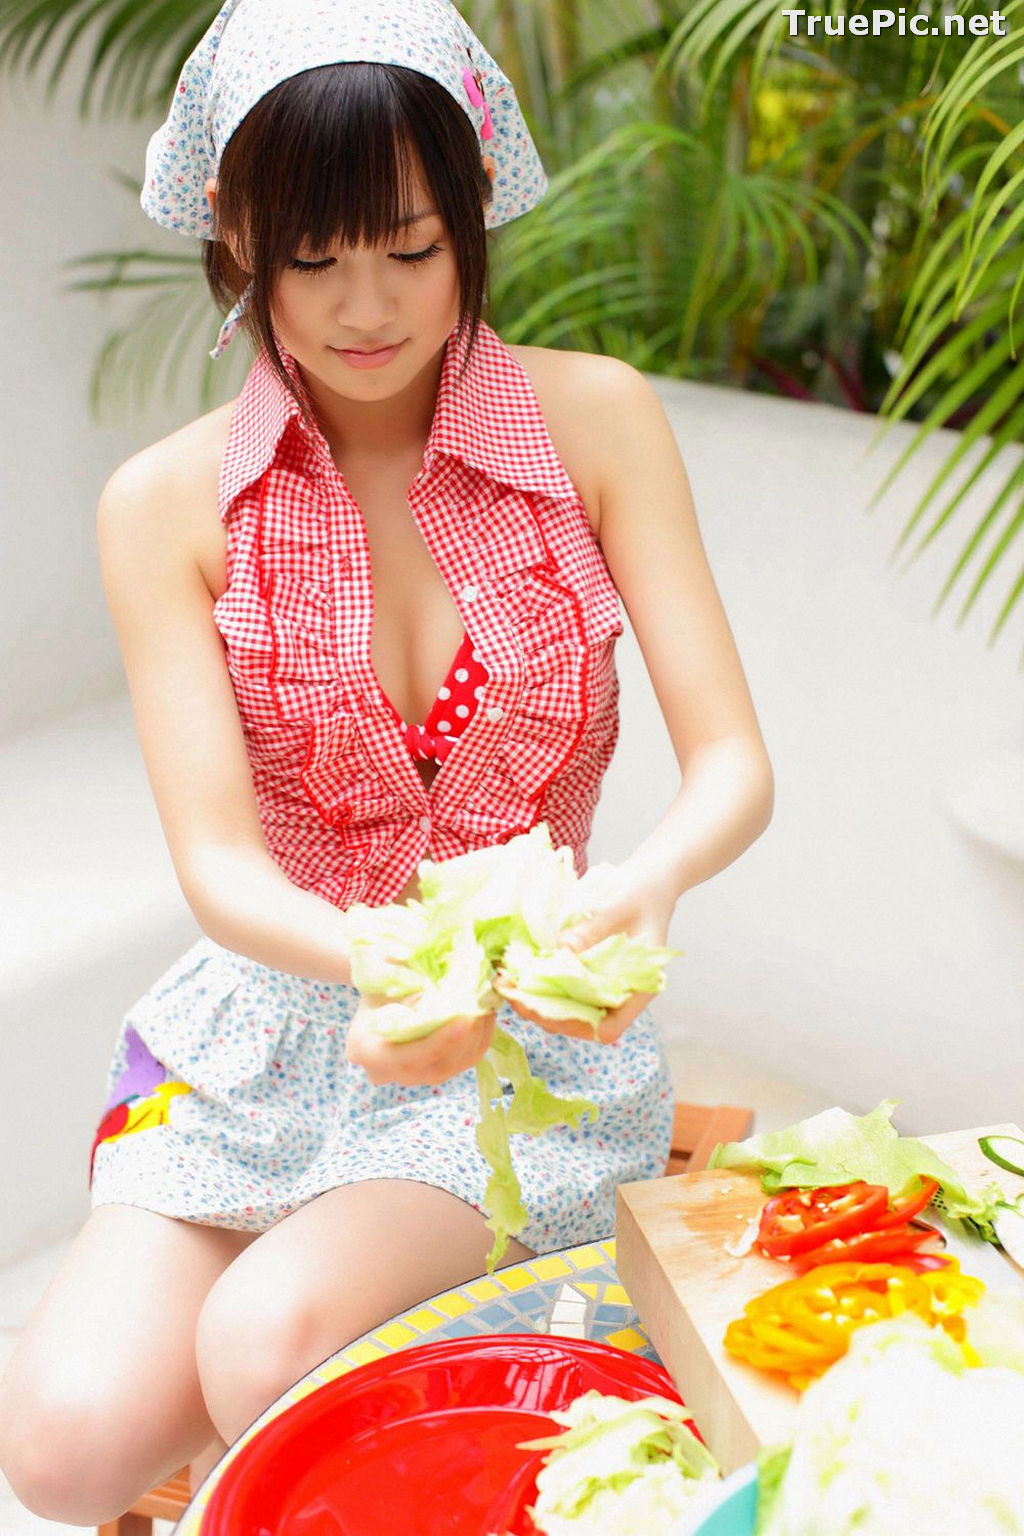 Image [YS Web] Vol.330 - Japanese Actress and Singer - Maeda Atsuko - TruePic.net - Picture-7